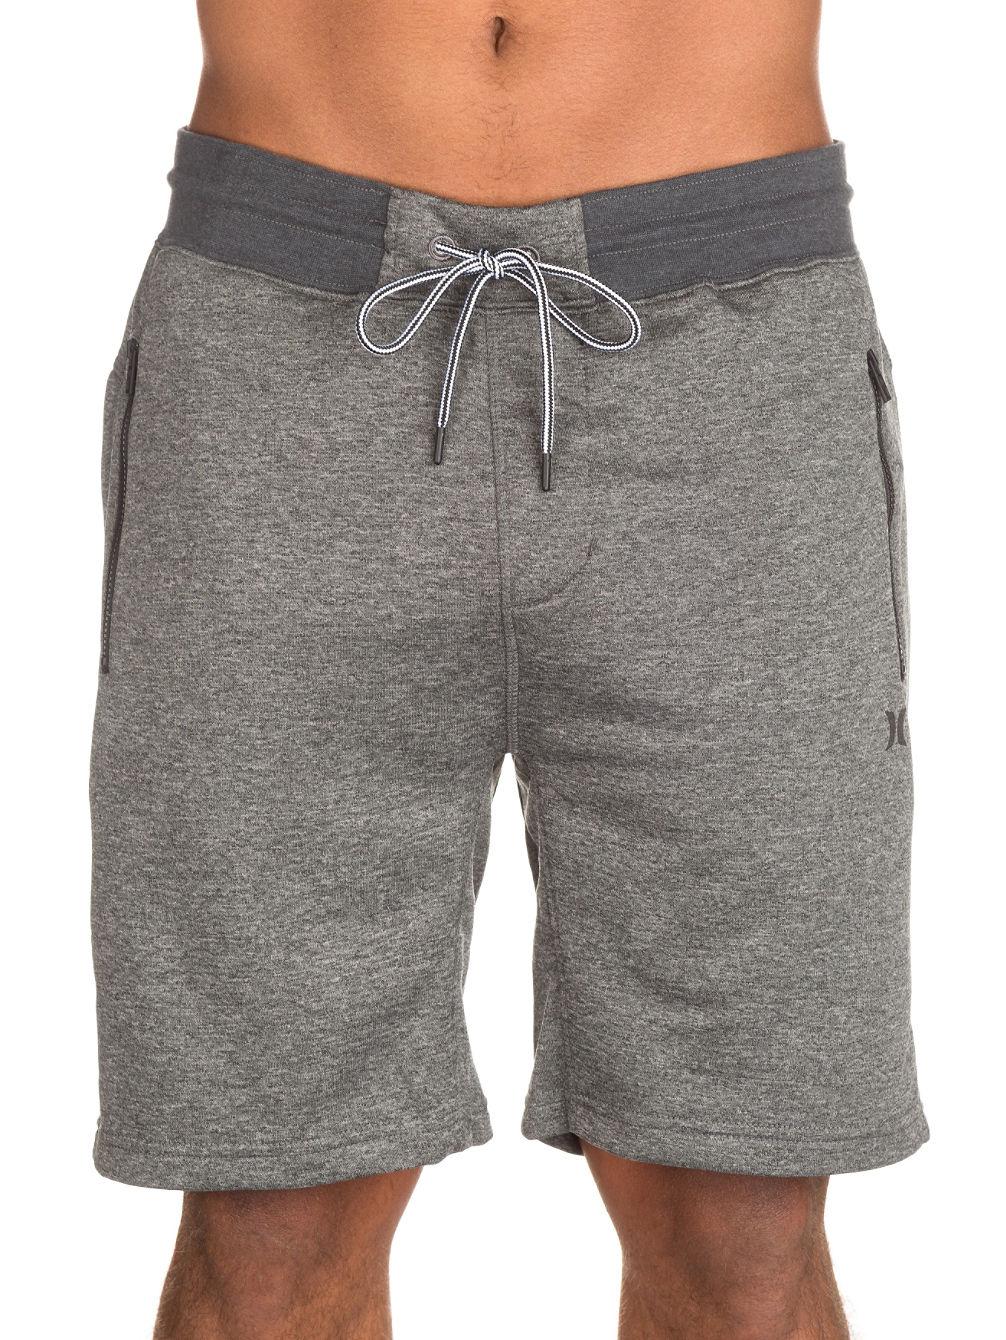 hurley-dri-fit-disperse-20-shorts